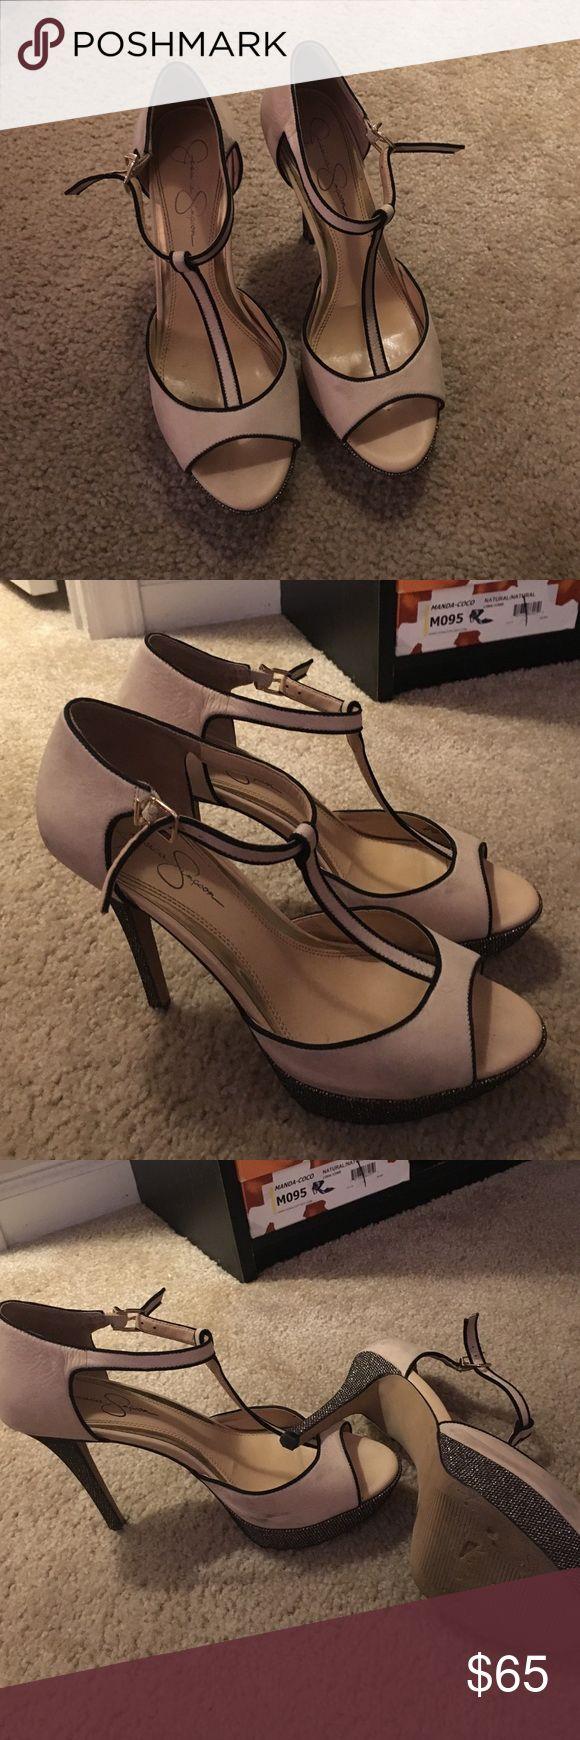 Jessica Simpson heels! Beautiful nude and black sparkly T-Strap heels! Jessica Simpson Shoes Heels